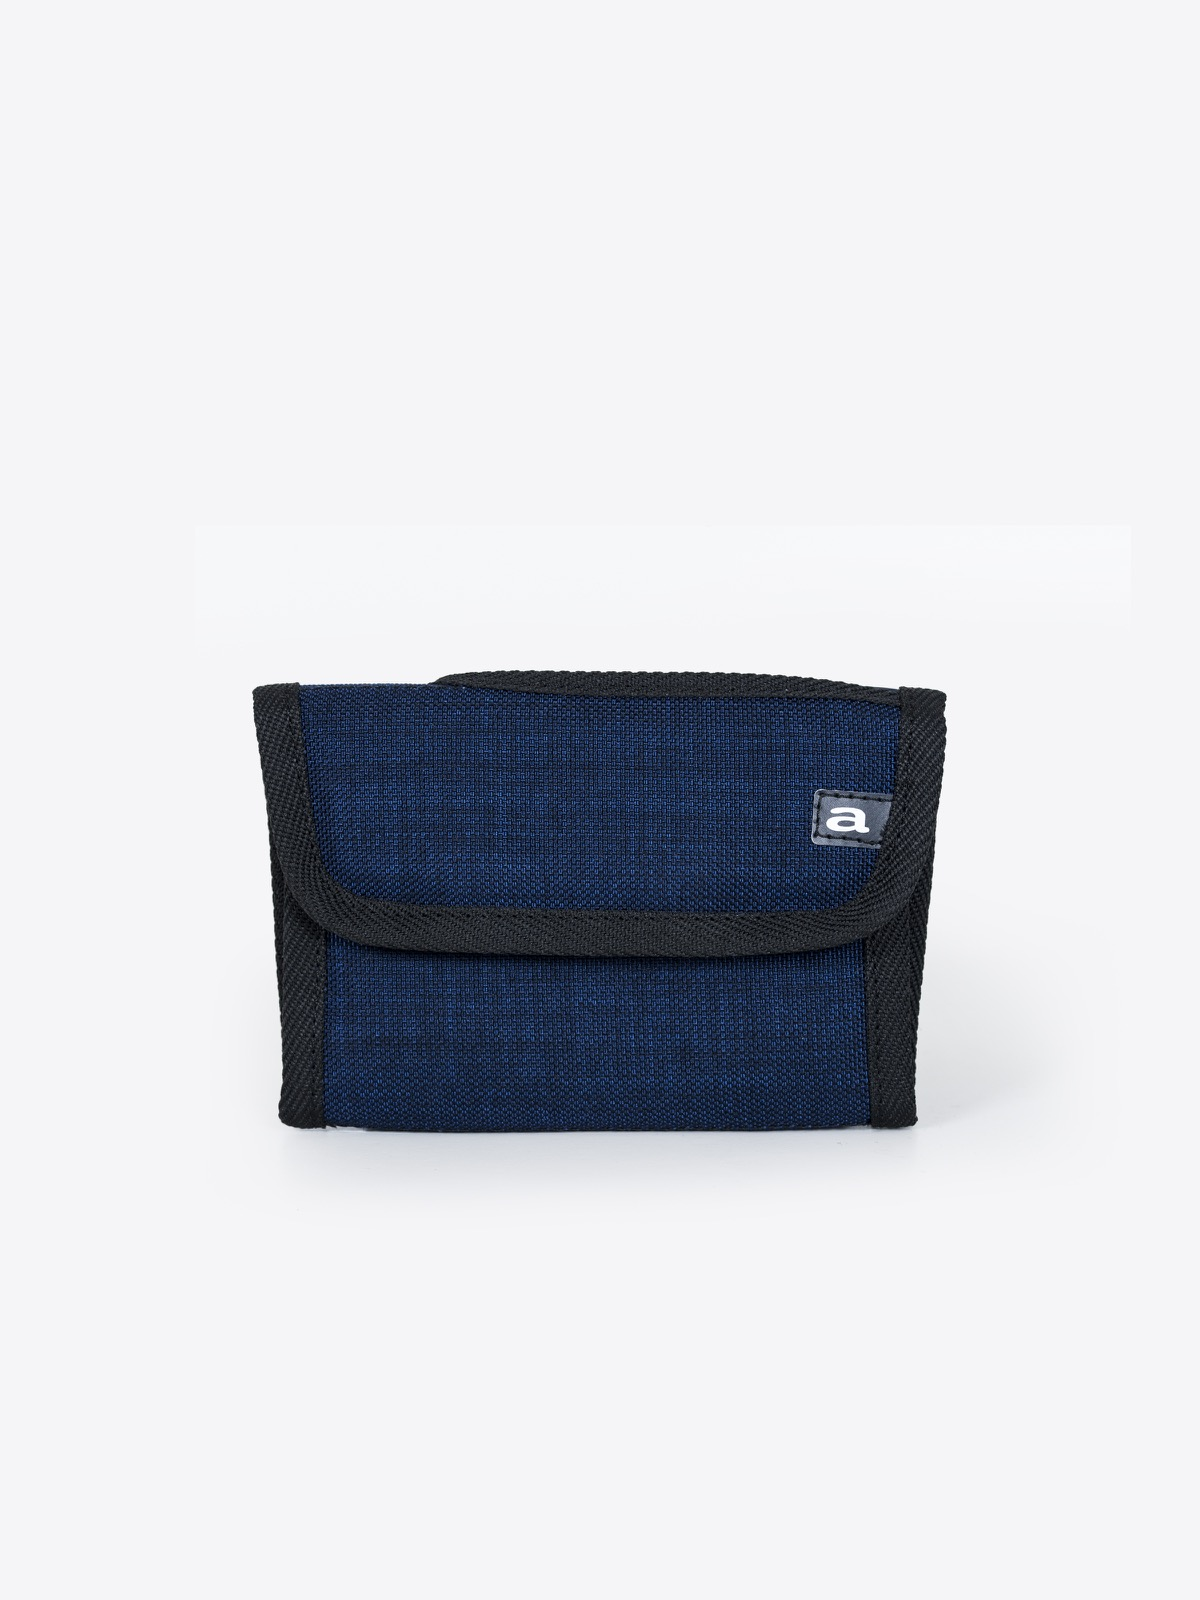 airbag craftworks palermo | nylon deep blue